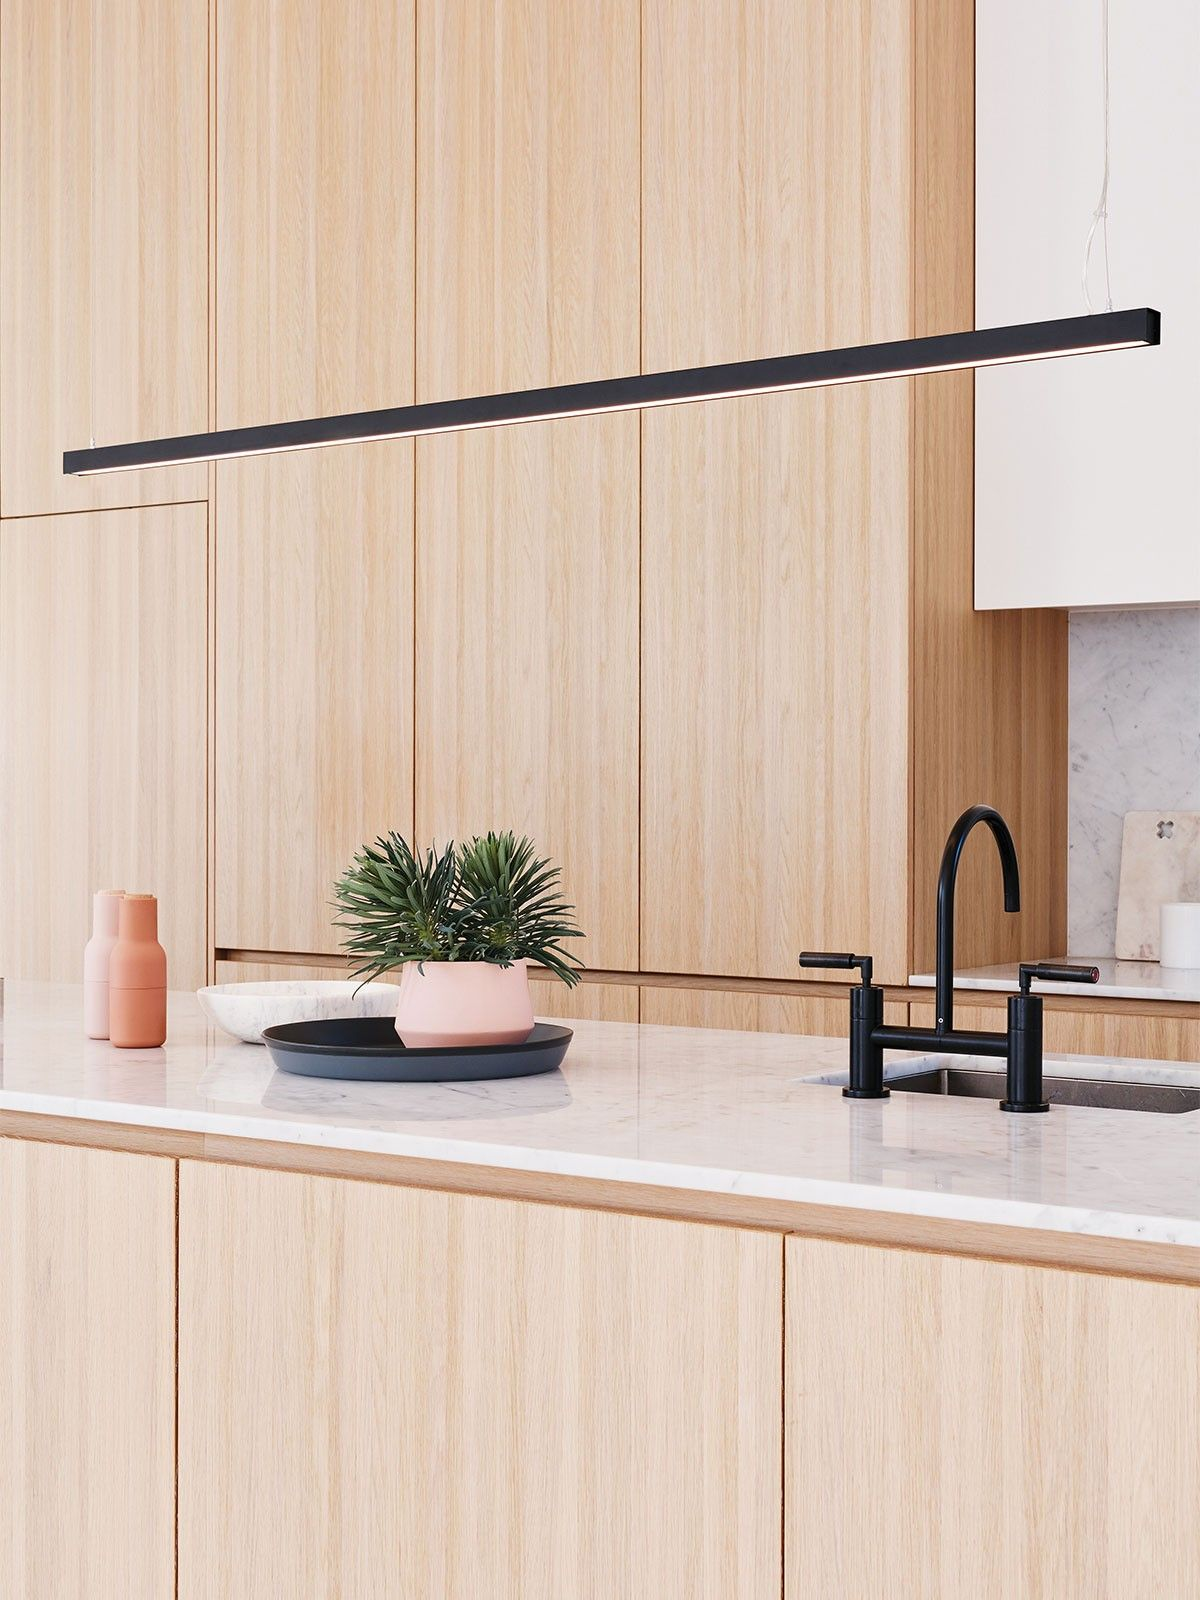 Ledlux Strix Led 2400 Lumen Dimmable Pendant In Black Modern Pendants Pendant Lights